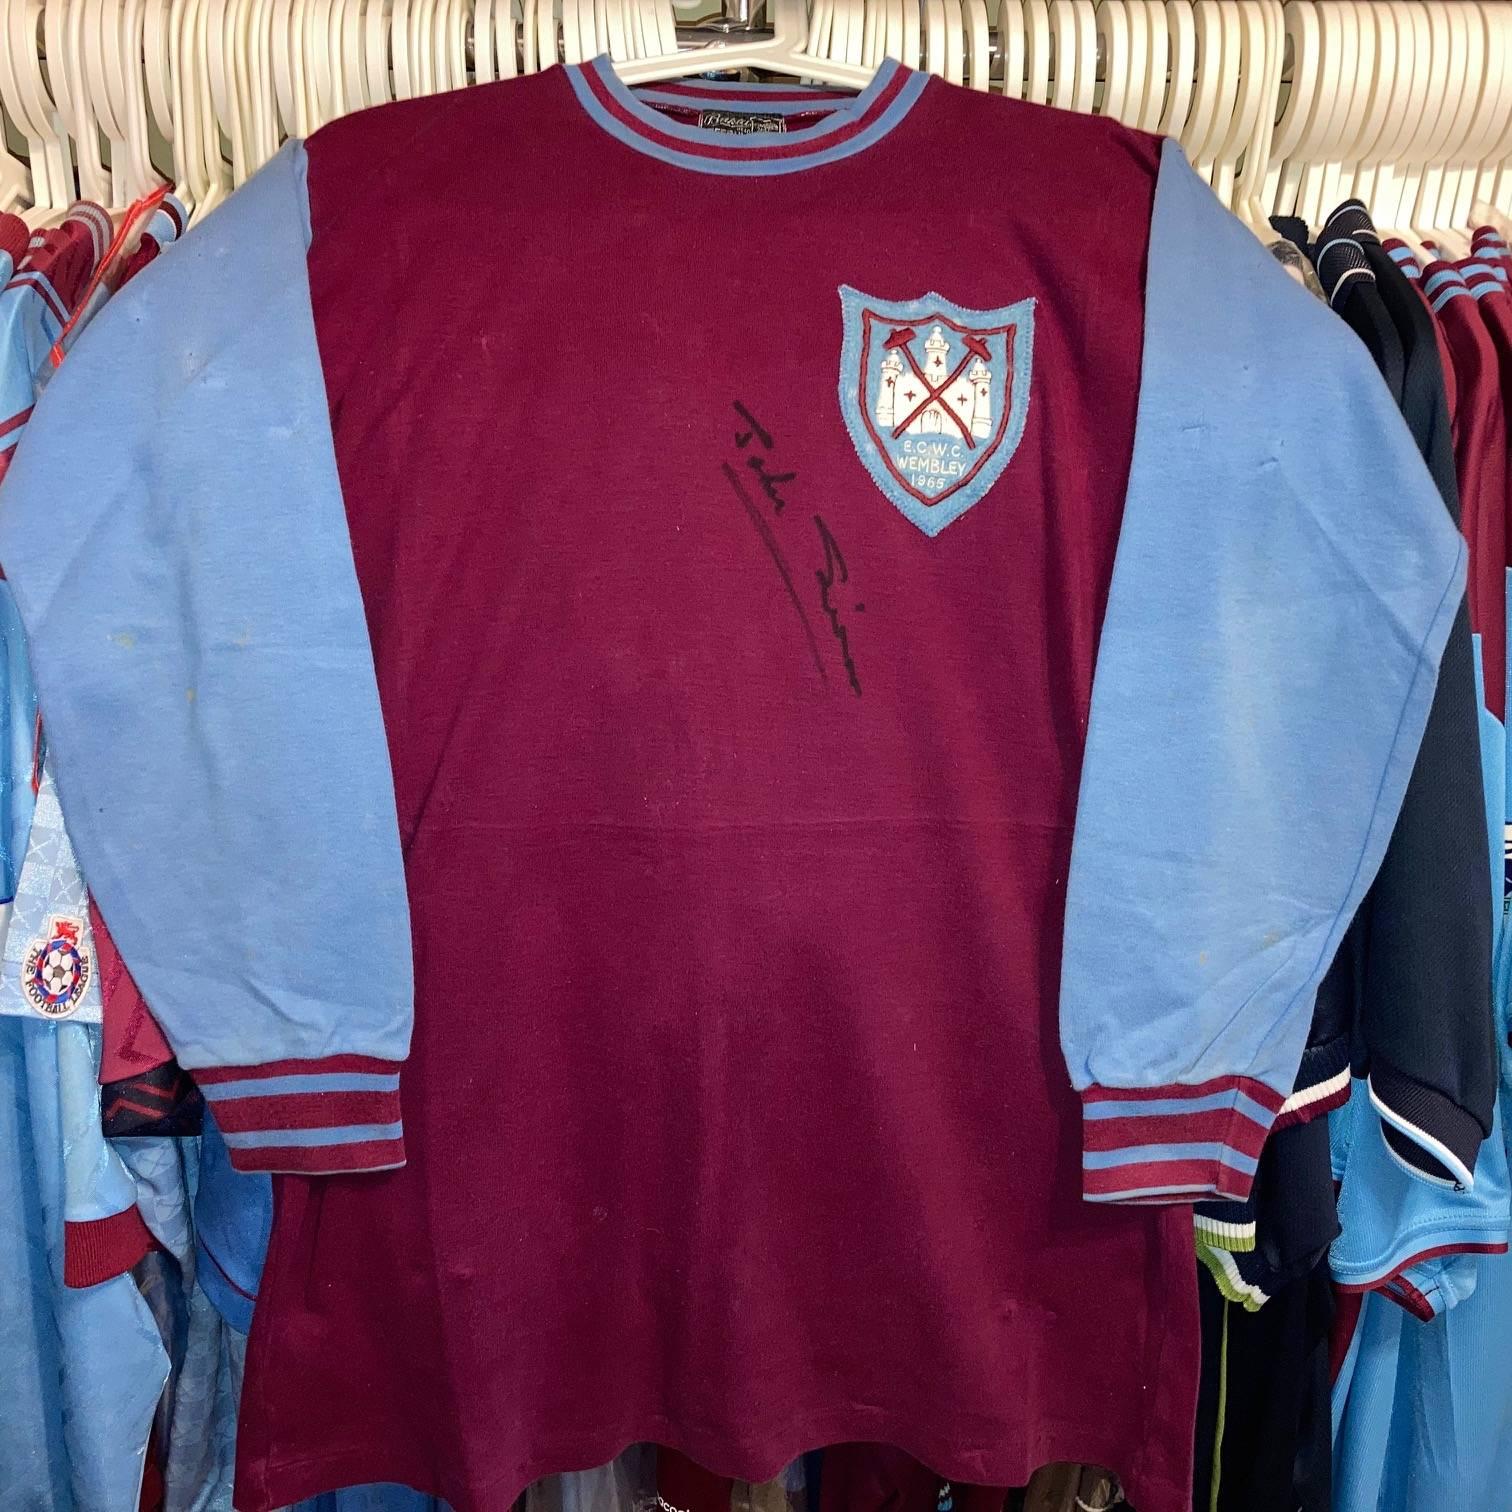 John Sissons worn and signed 1965 ECWC Final shirt.